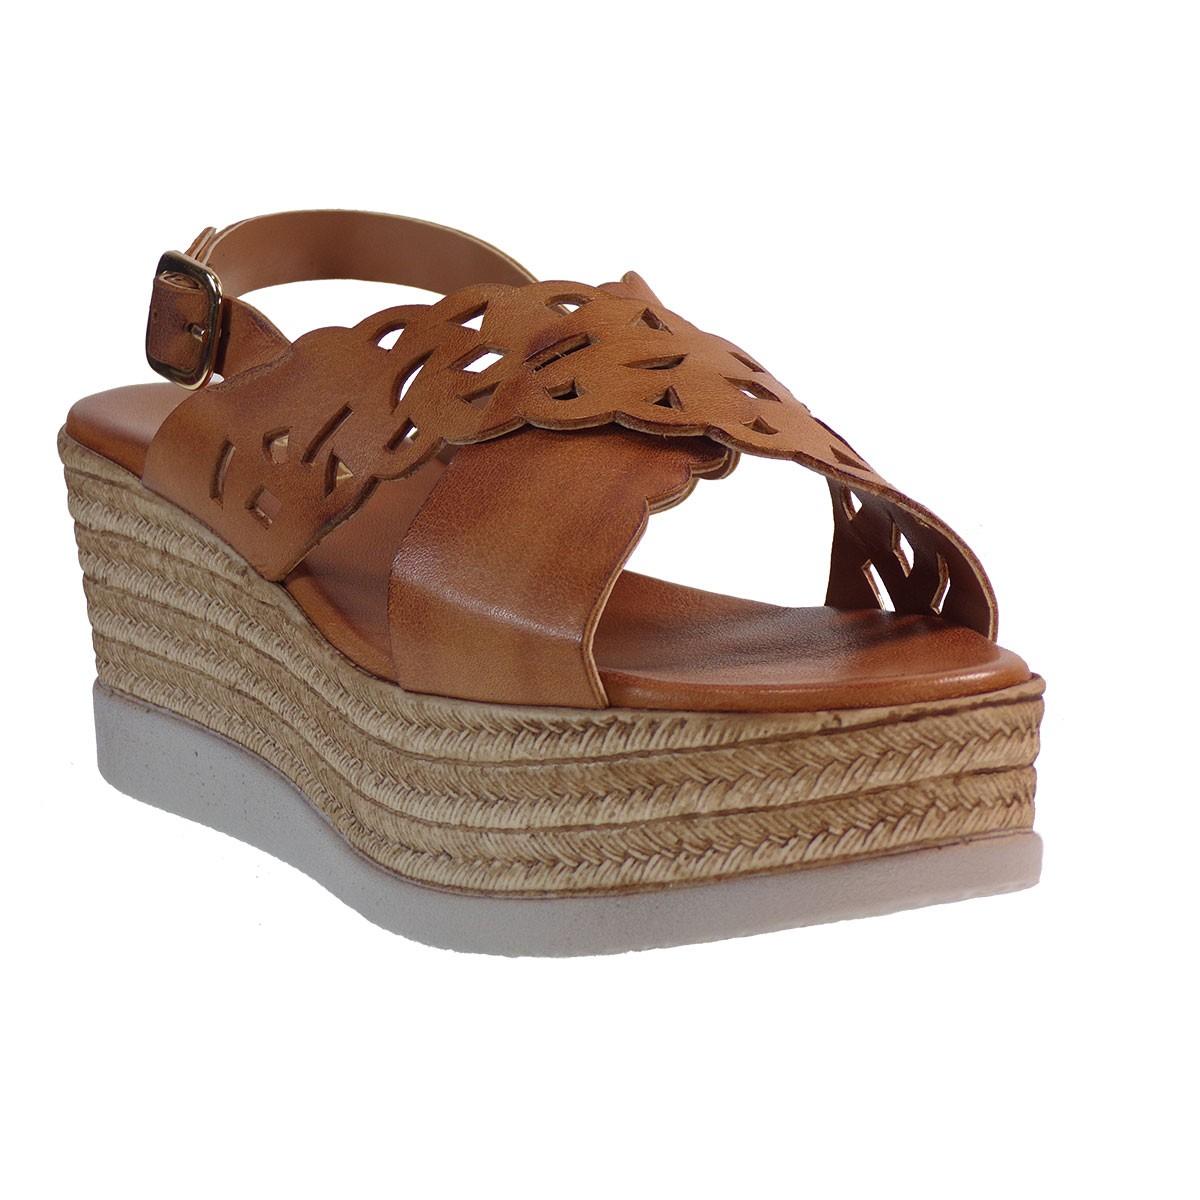 Fardoulis shoes Γυναικείες Πλατφόρμες Πέδιλα 64440 Ταμπά Δέρμα